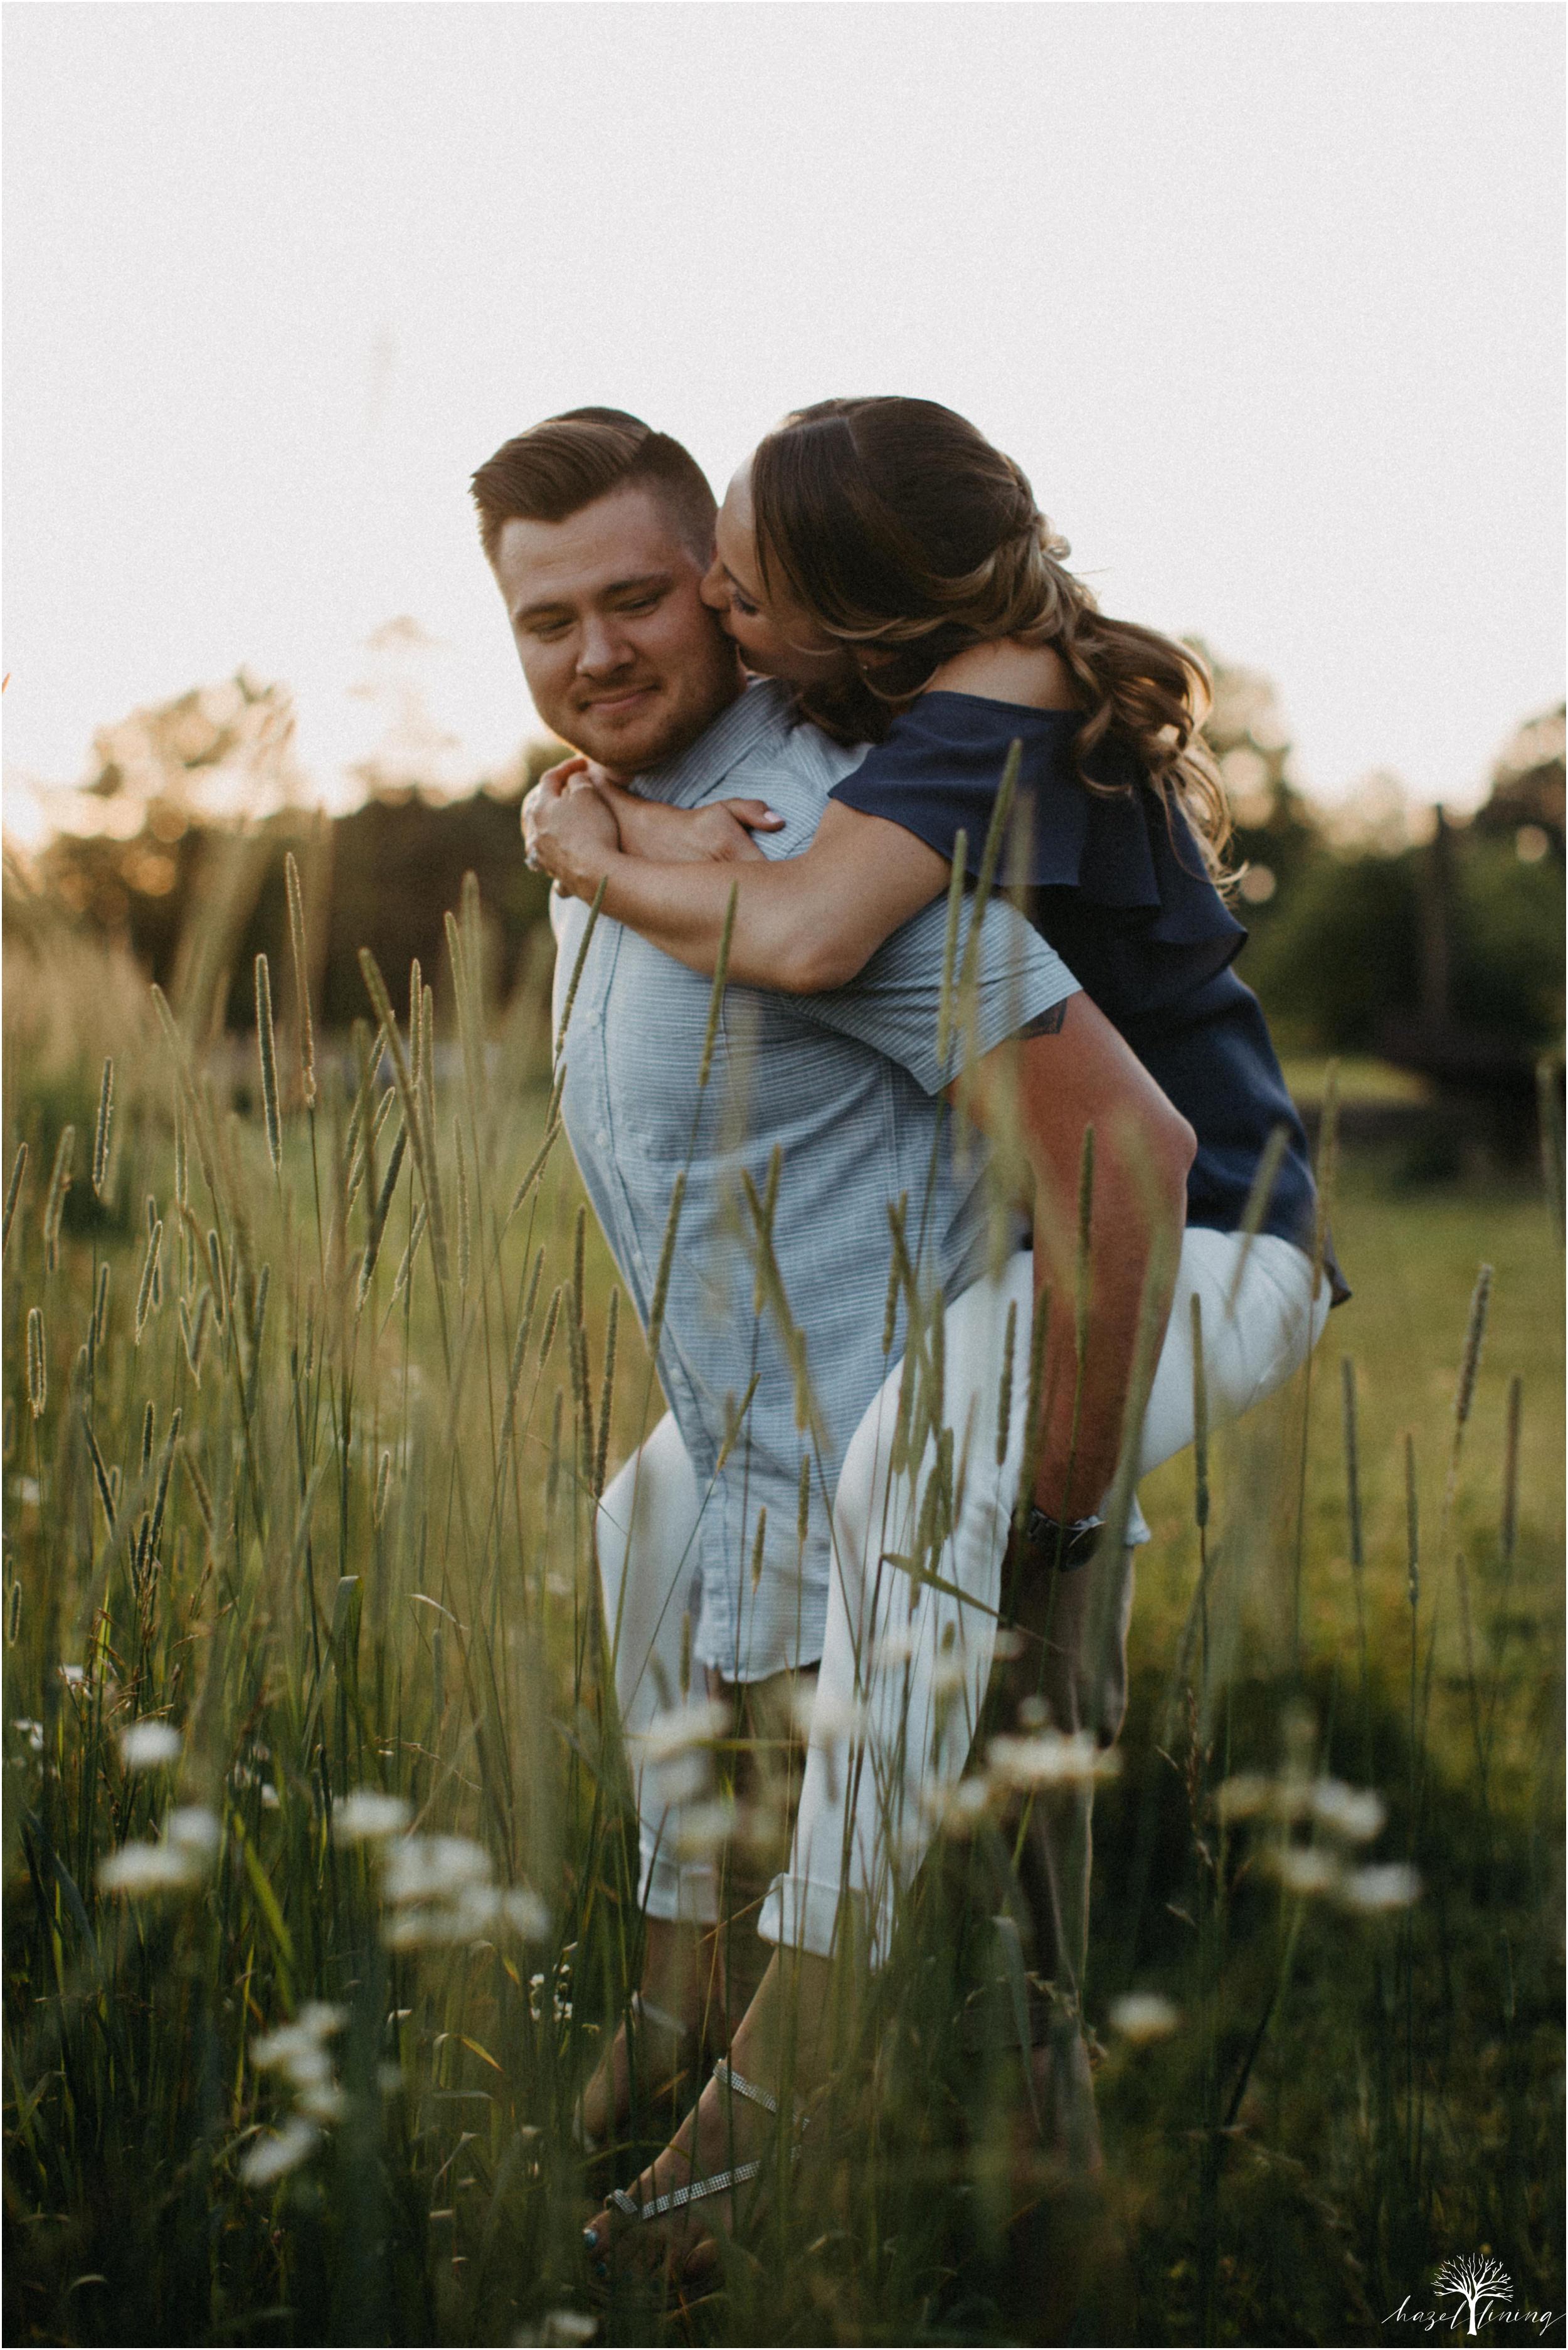 rachel-warner-chris-niedrist-the-farm-bakery-and-events-quakertown-pa-summer-engagement-hazel-lining-photography-destination-elopement-wedding-engagement-photography_0033.jpg